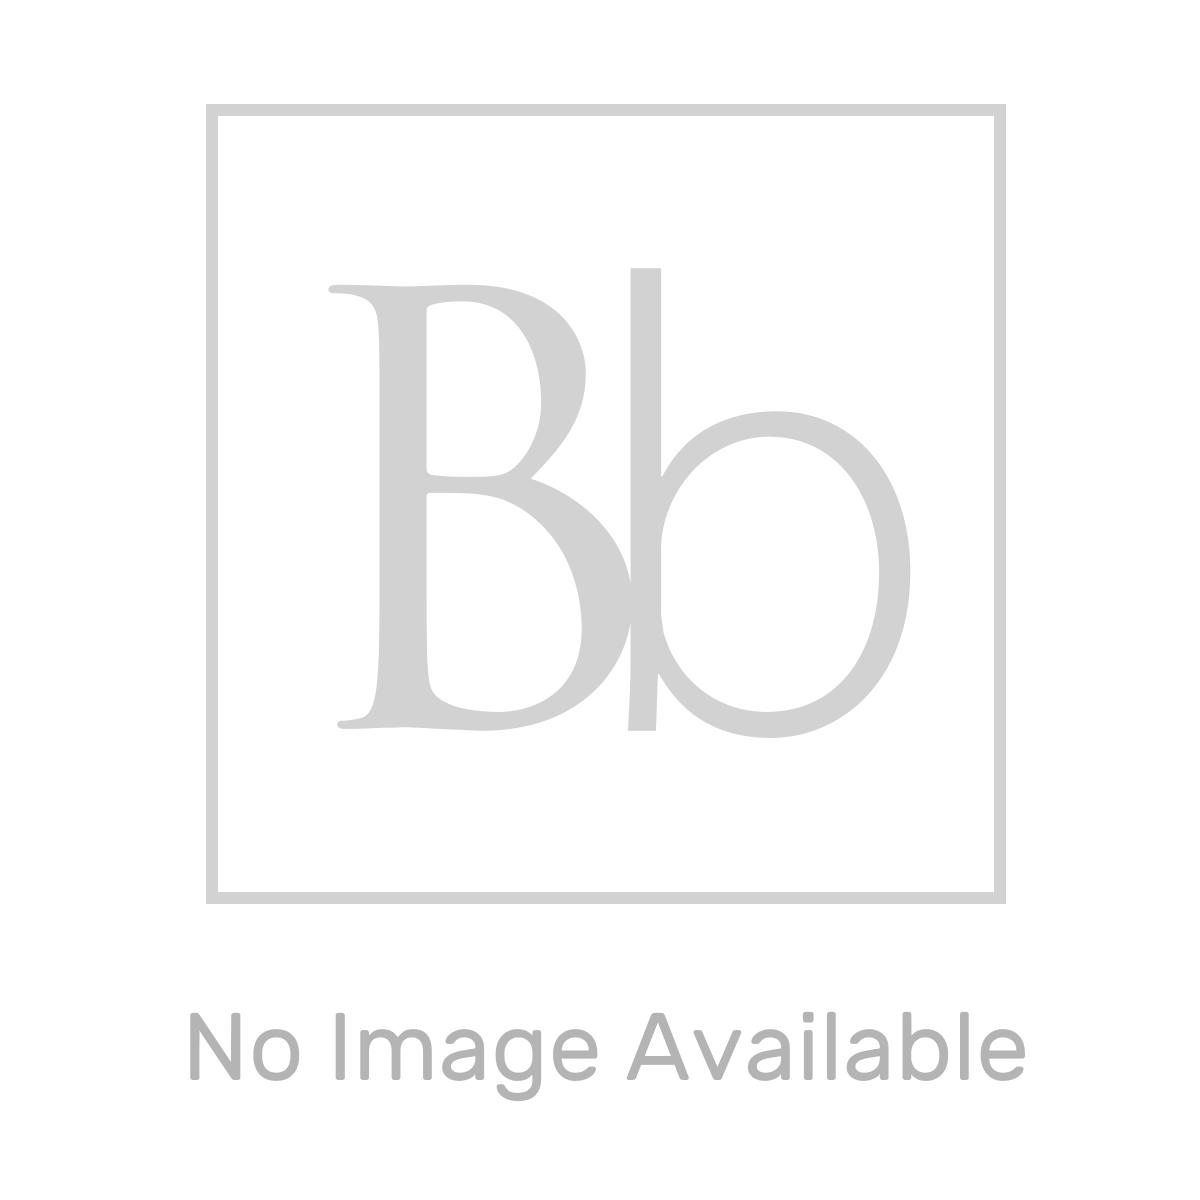 RAK Feeling Cappuccino Rectangular Shower Tray 1600 x 800mm Measurements